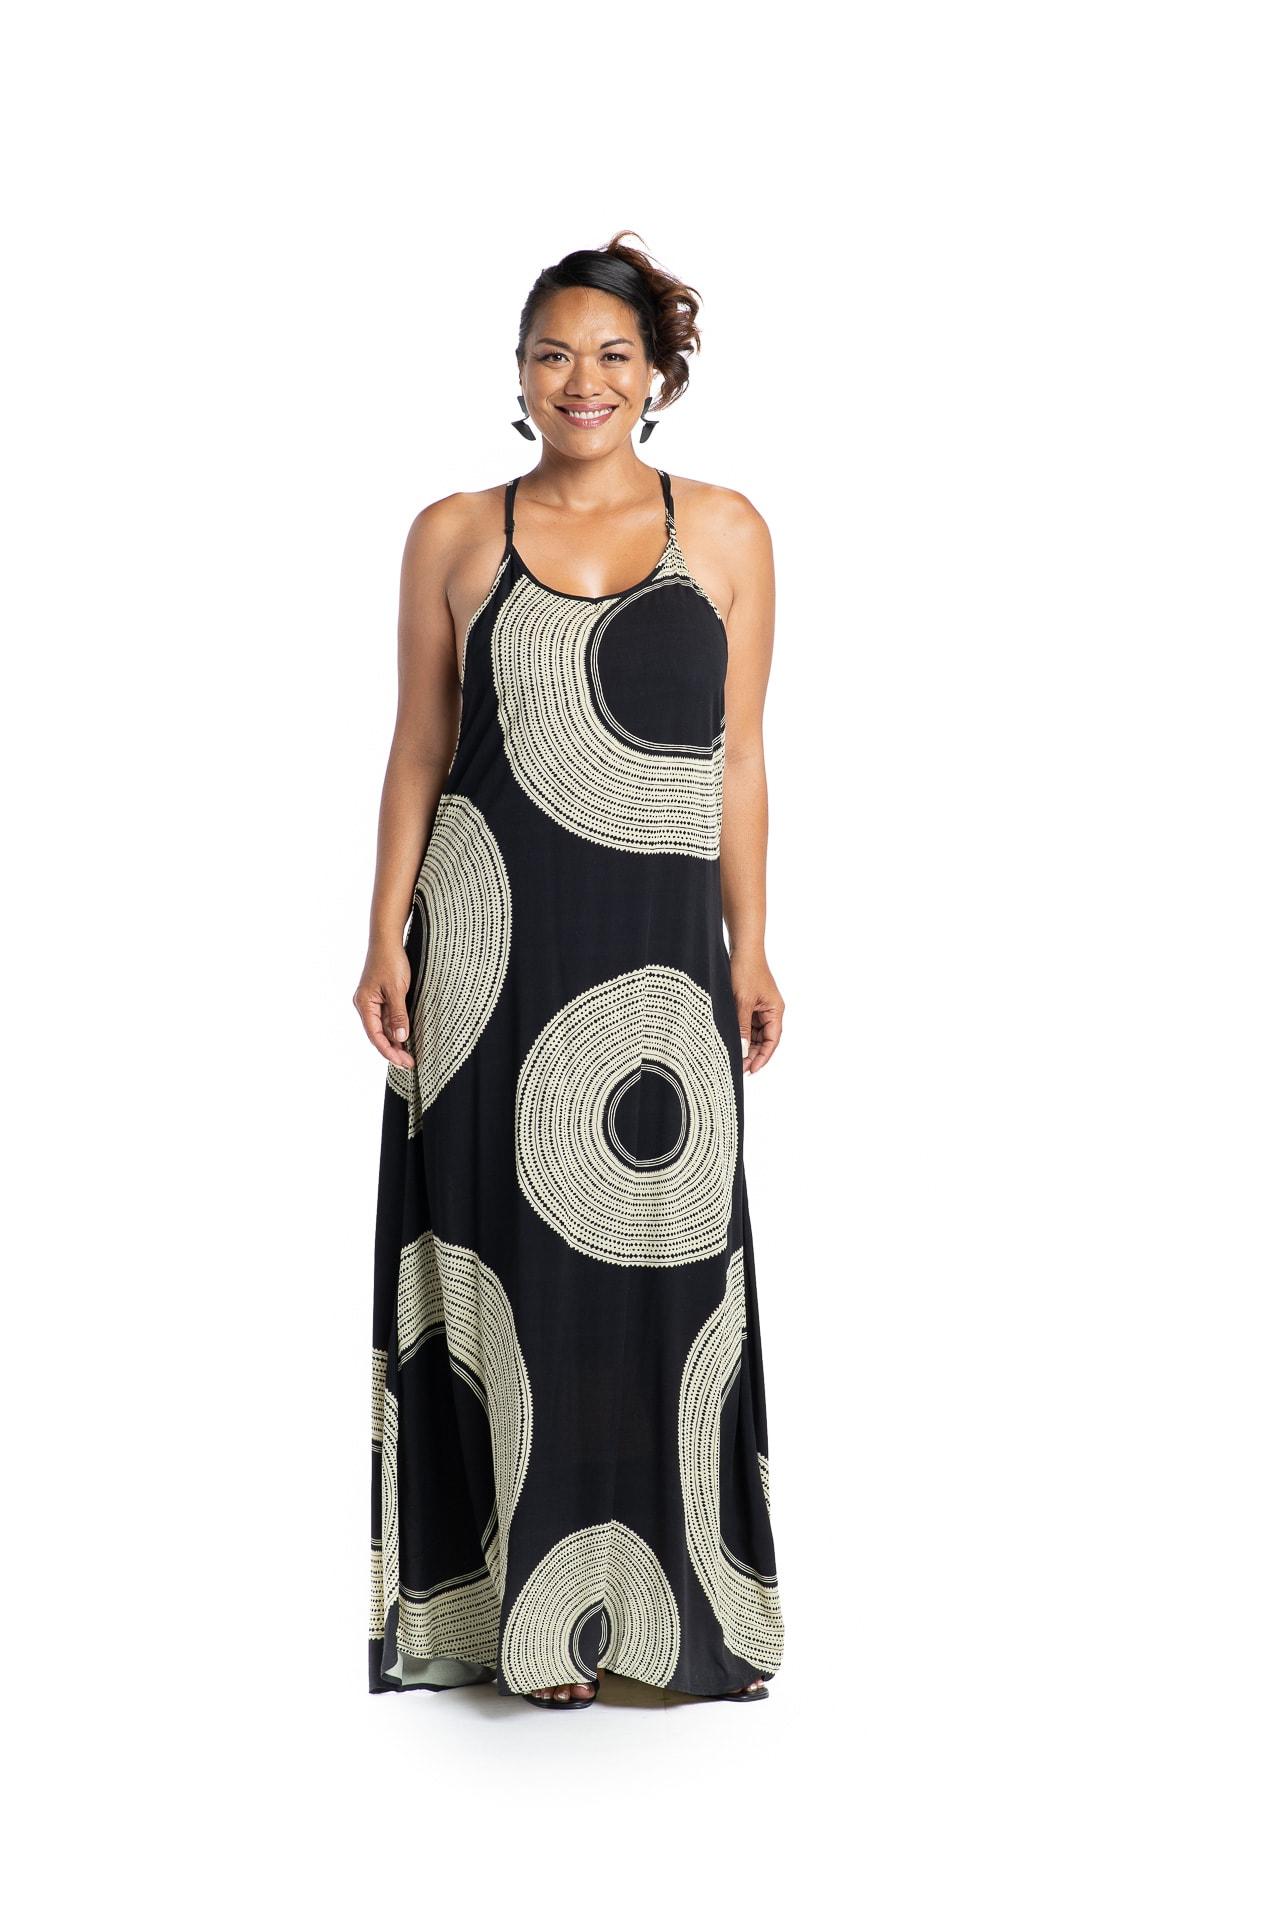 Model wearing Haili Dress - Front View